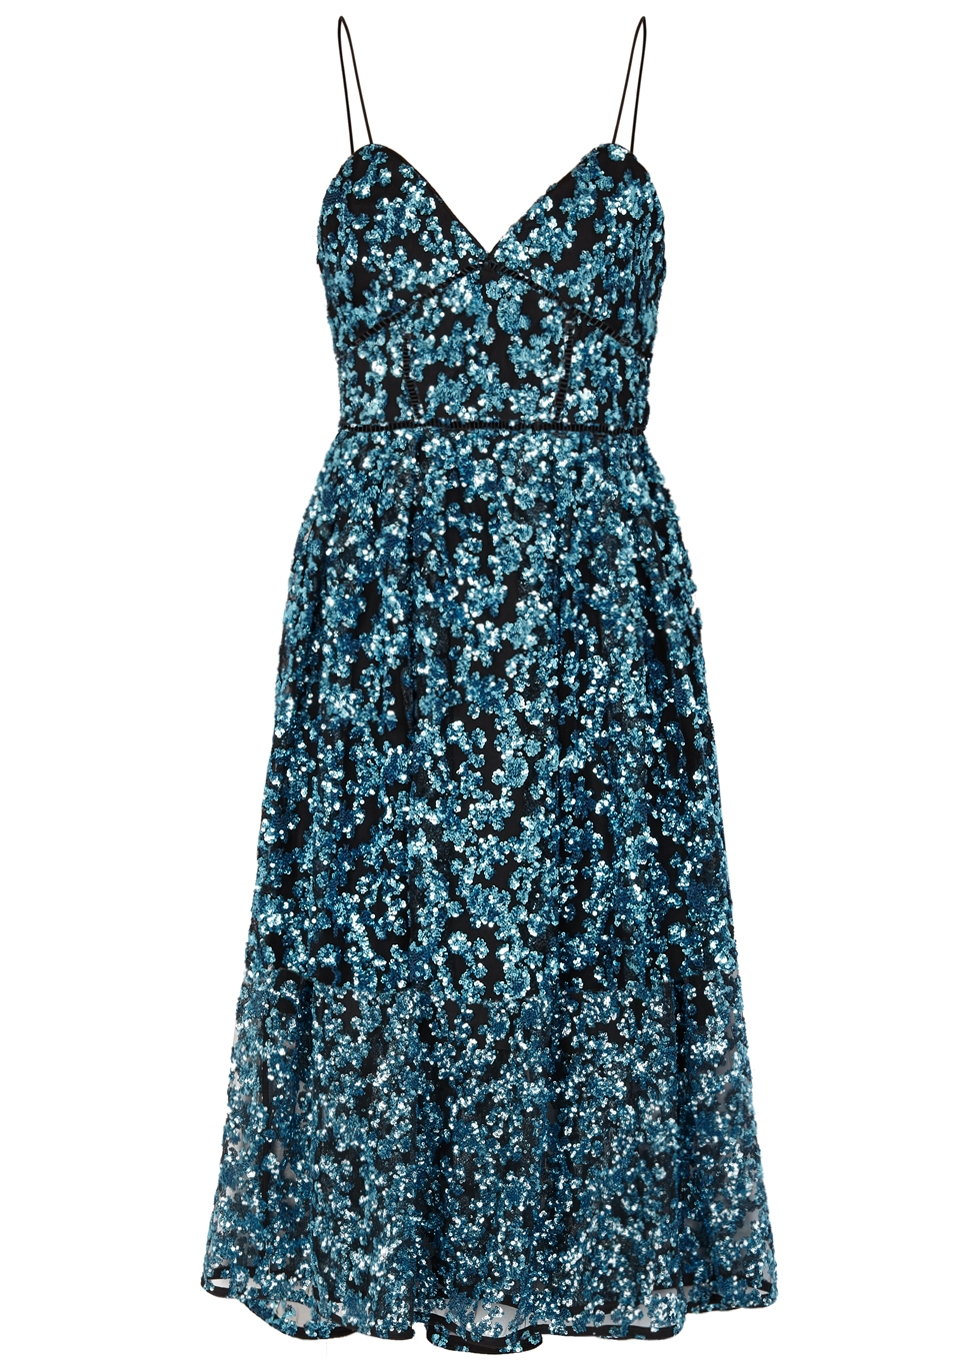 Self Portrait Azaelea Blue Sequinned Dress Harvey Nichols